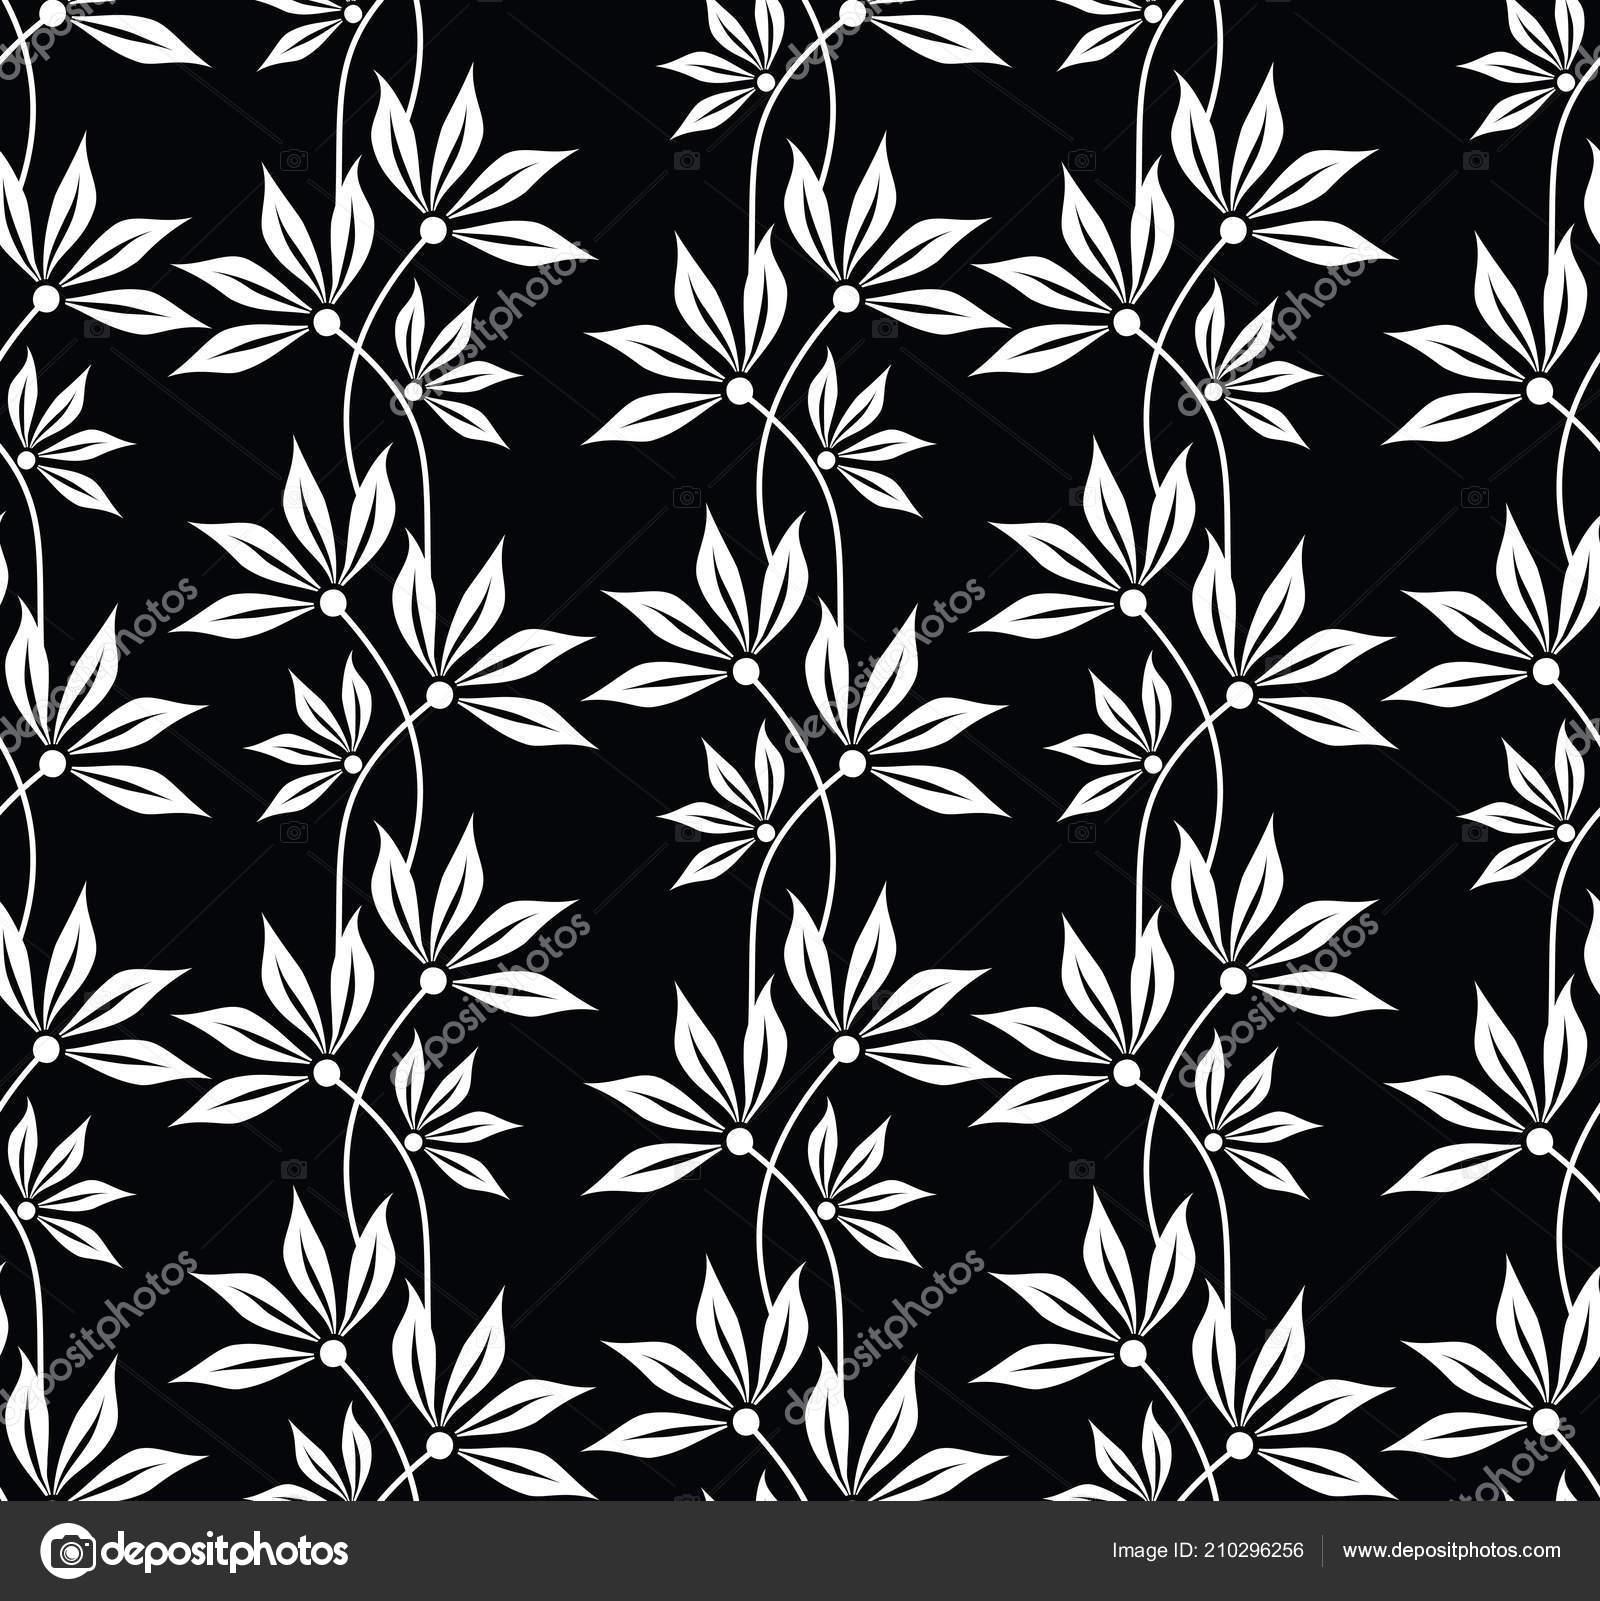 Seamless Black White Cute Leaves Pattern Design Vector Image By C Malkani Stock 210296256